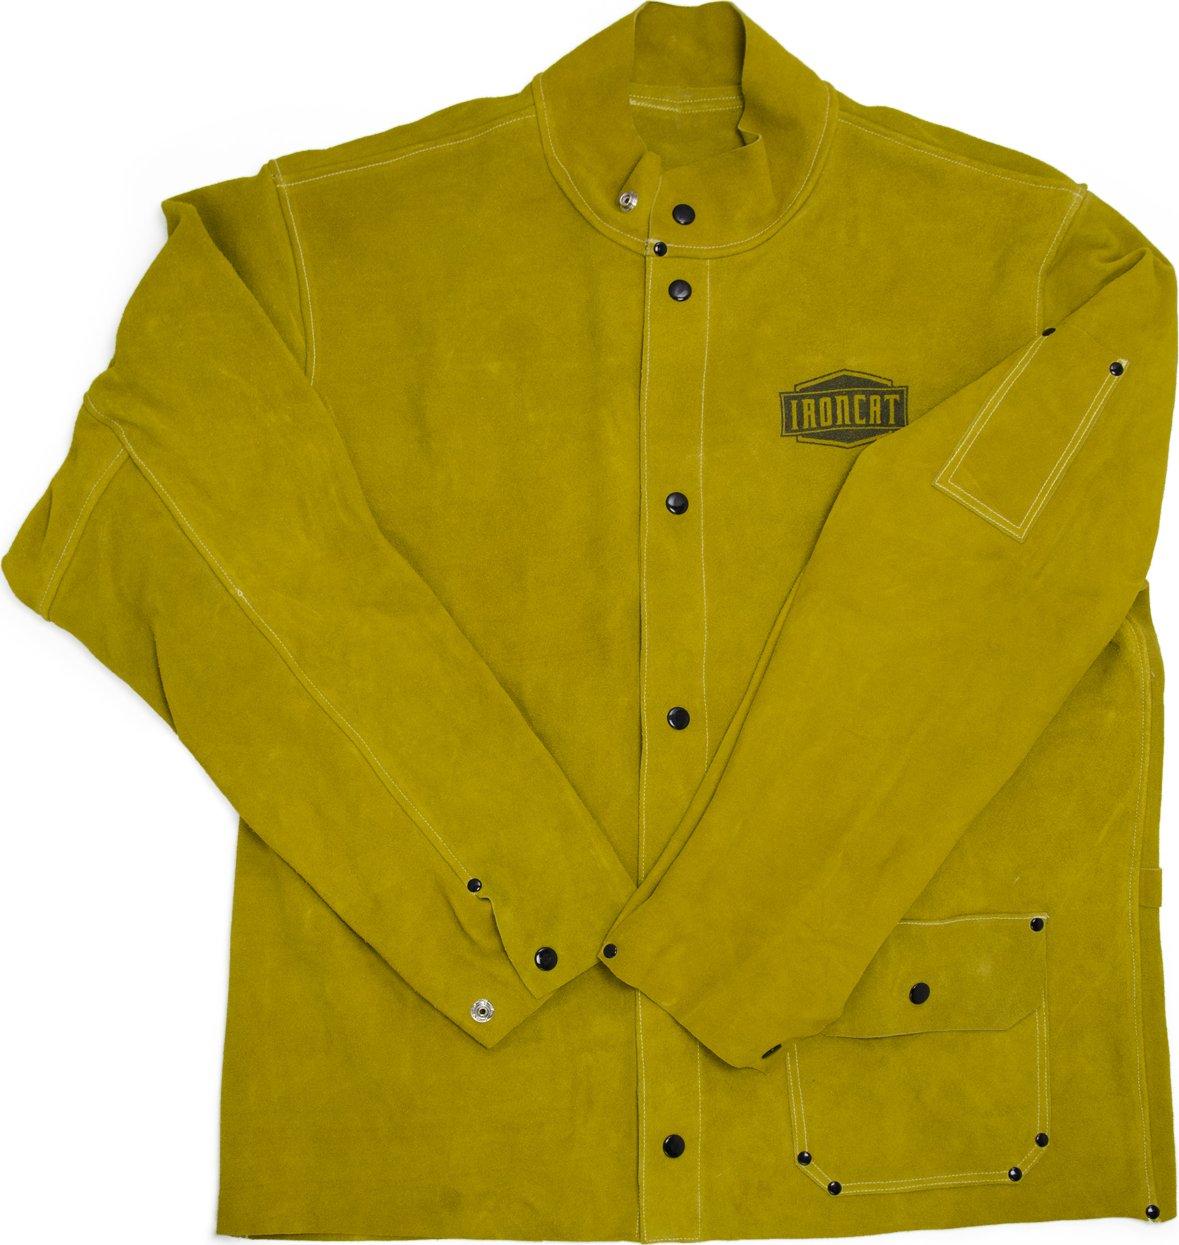 West Chester IRONCAT 7005 Heat Resistant Split Cowhide Leather Welding Jacket, X-Large